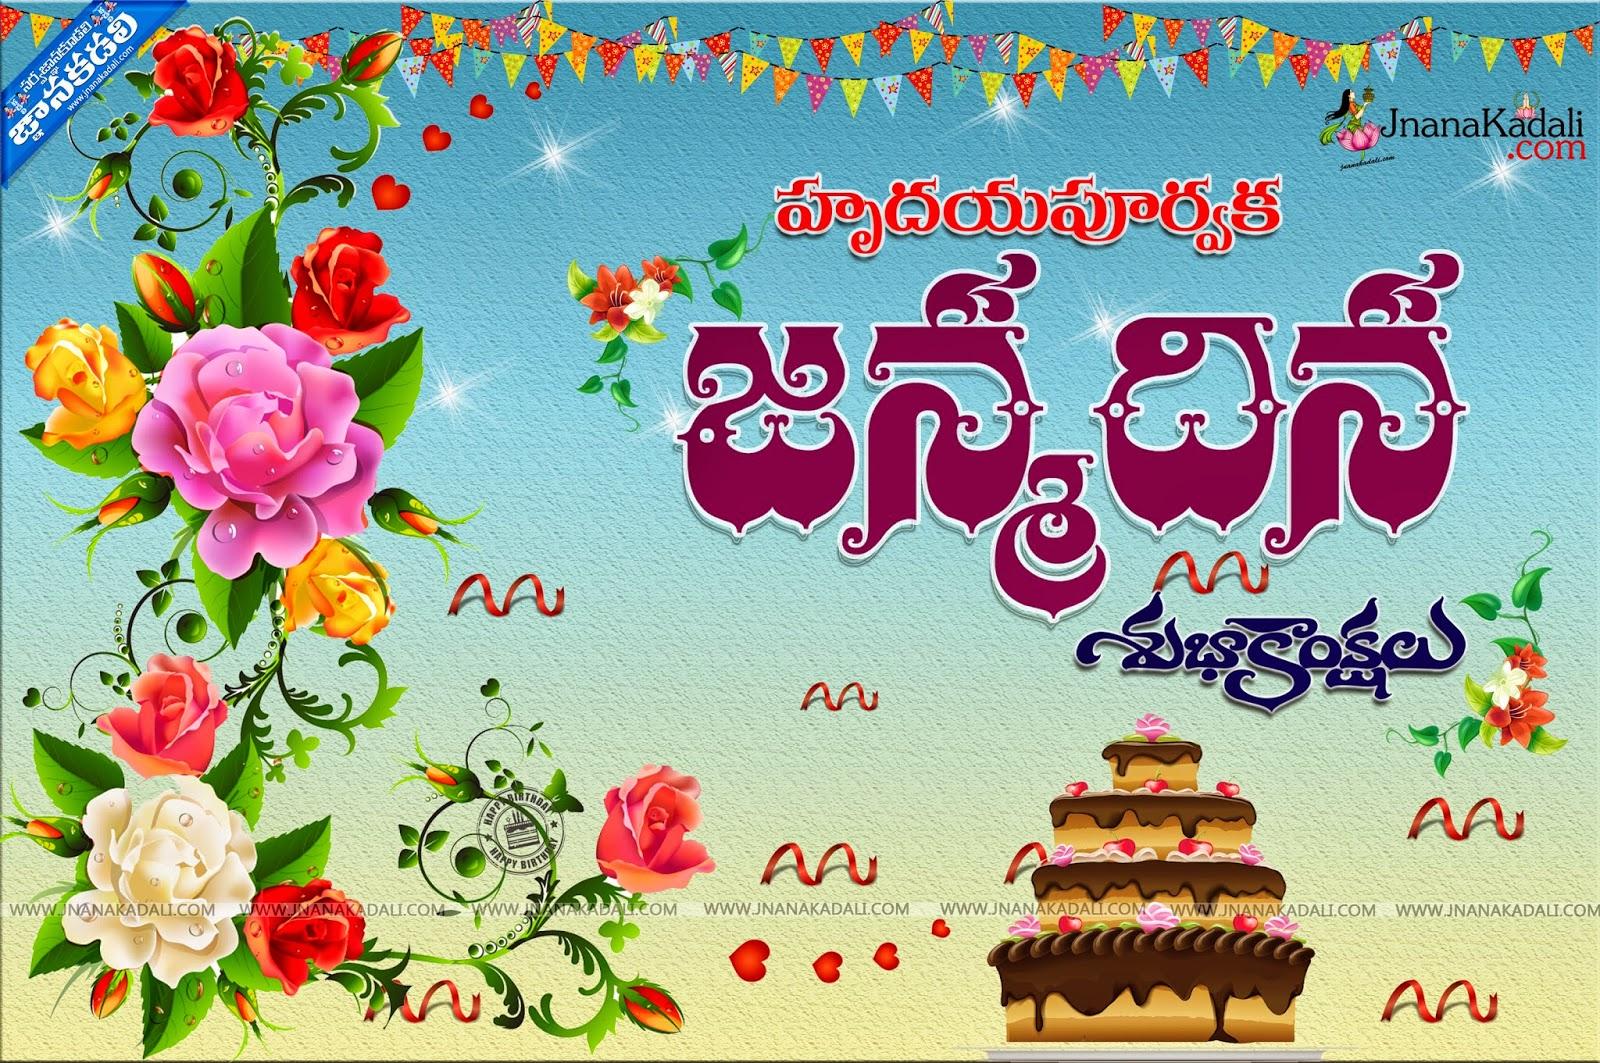 Happy birthday wishes to mom in telugu language happy birthday happy birthday wishes to mom in telugu language happy birthday song for mom in telugu m4hsunfo